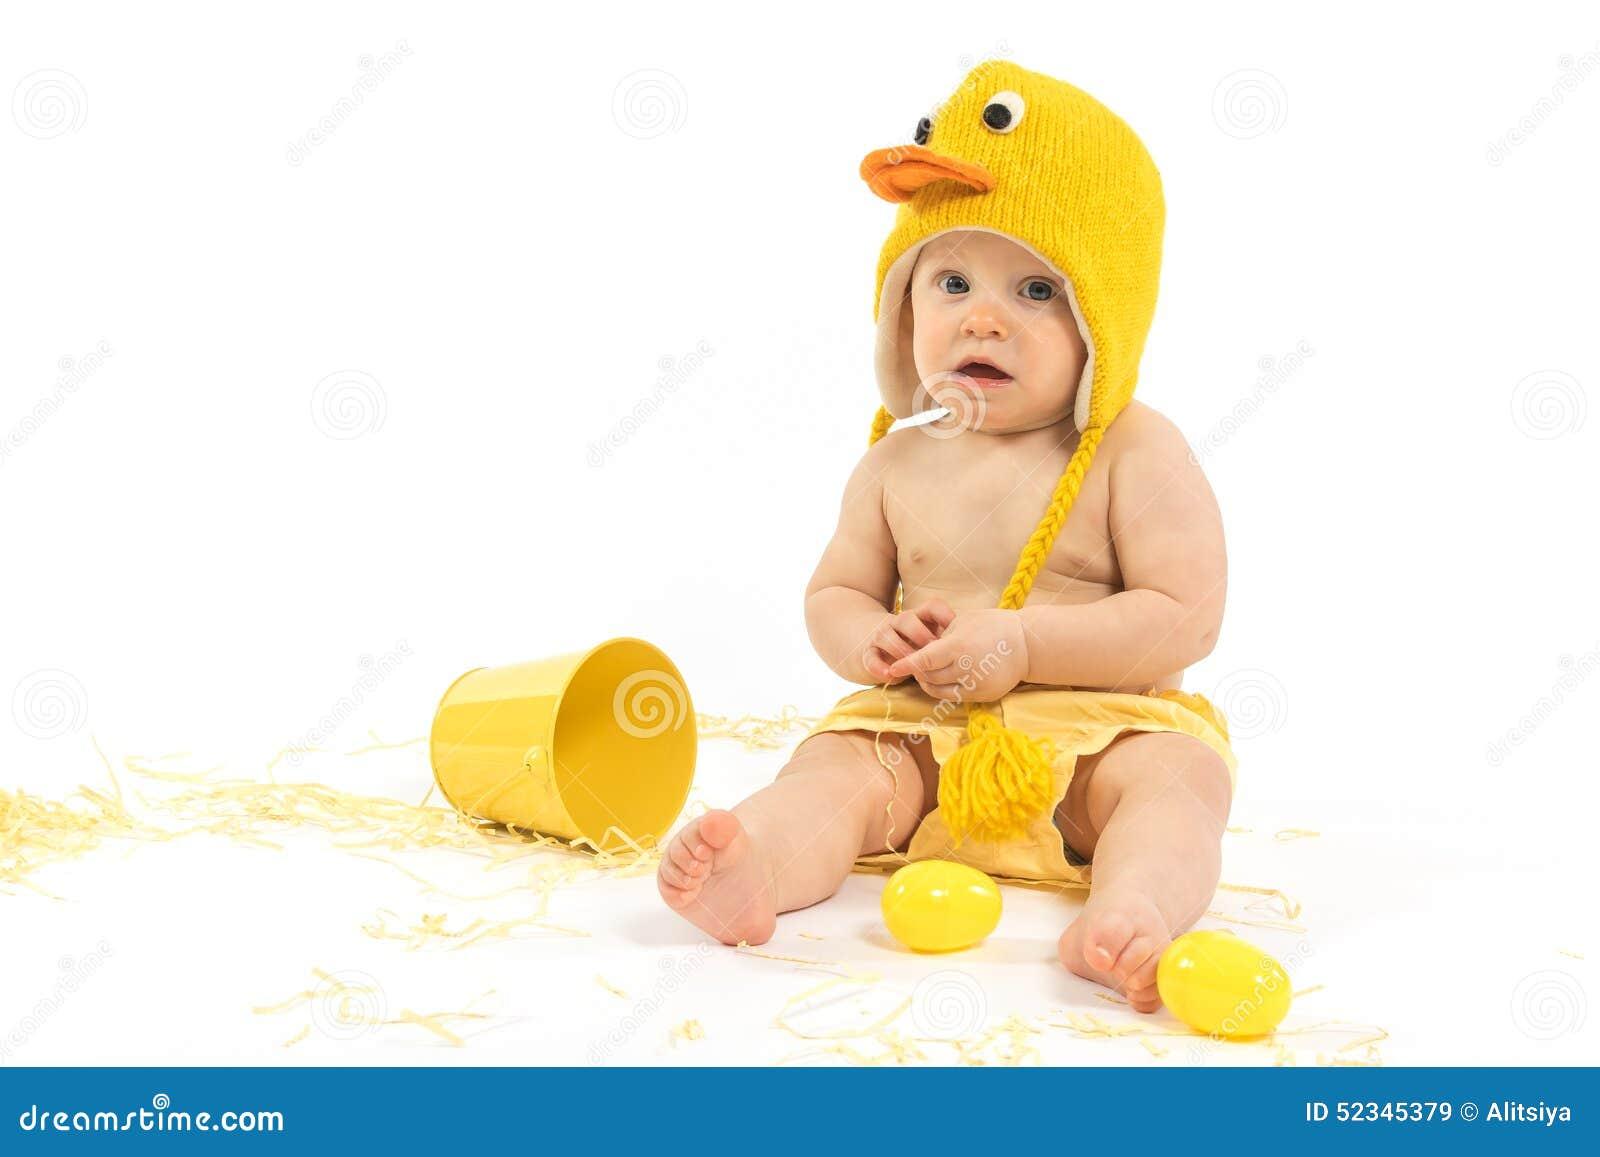 Easter Baby in Duck Costume